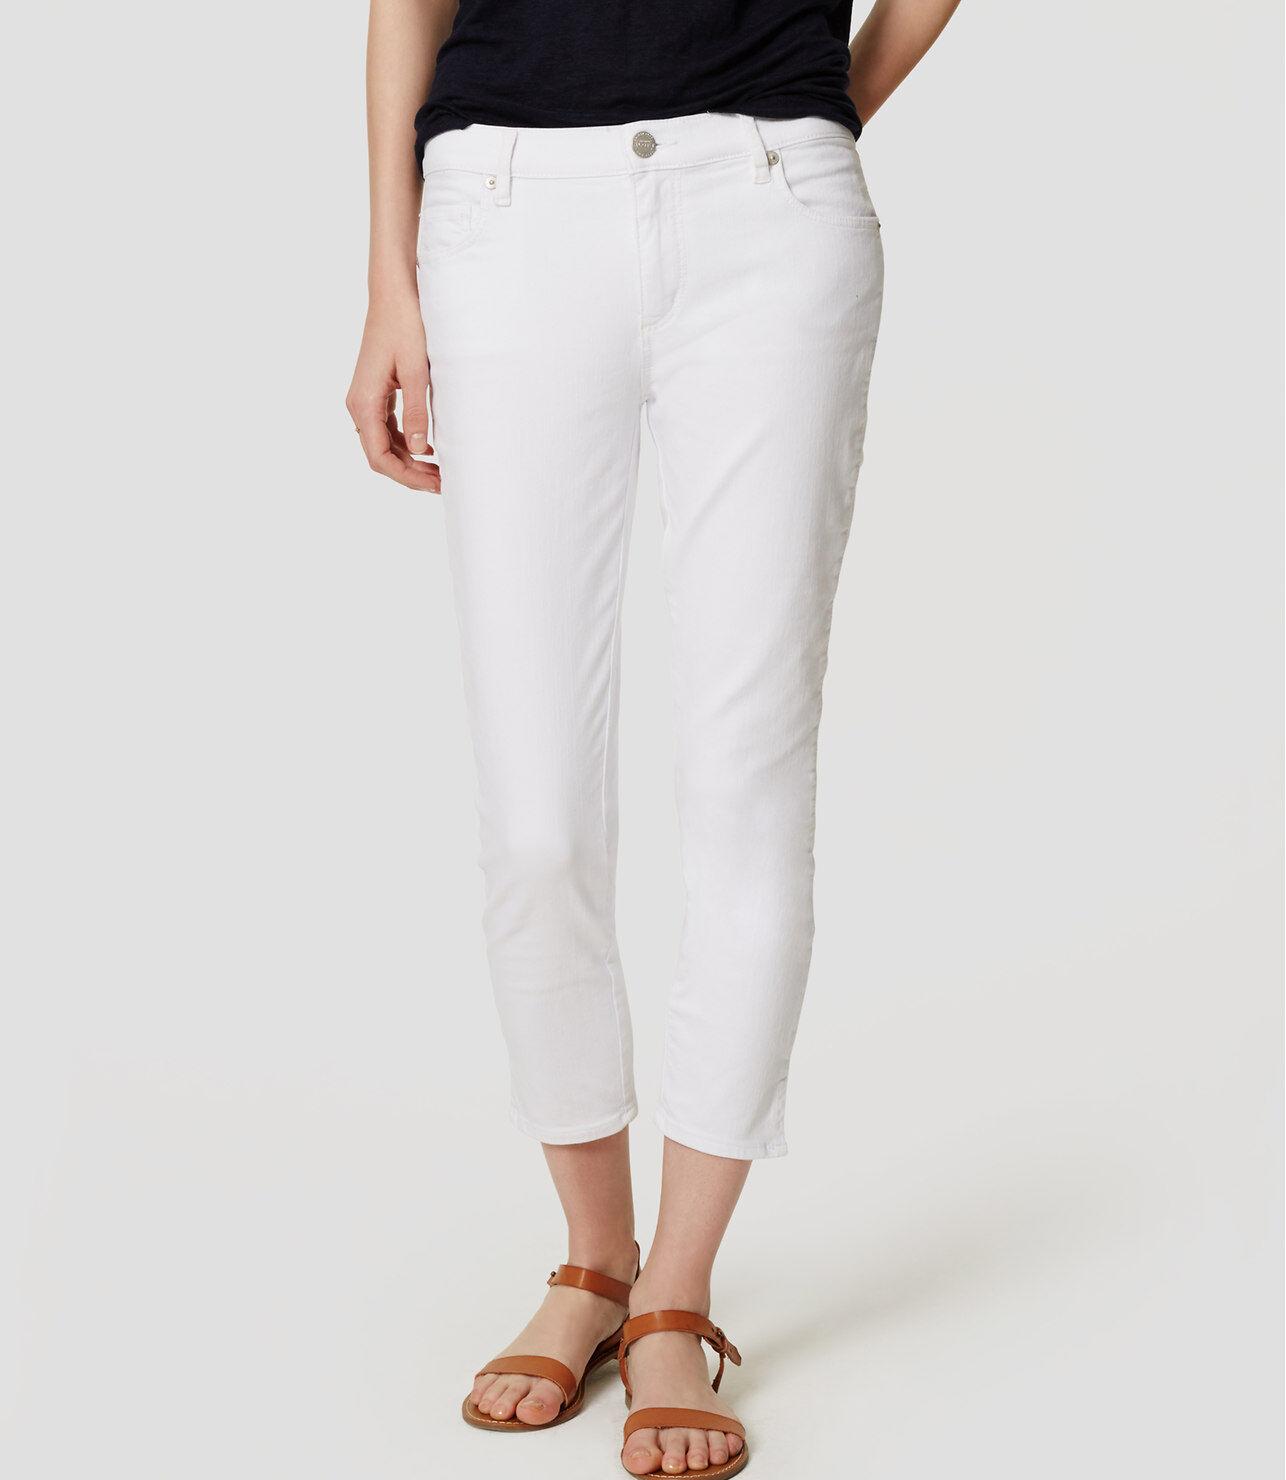 Ann Taylor LOFT Slim Vent Crop Jeans Pants in White Size 24 00P, 28 6P, 28 6 NWT